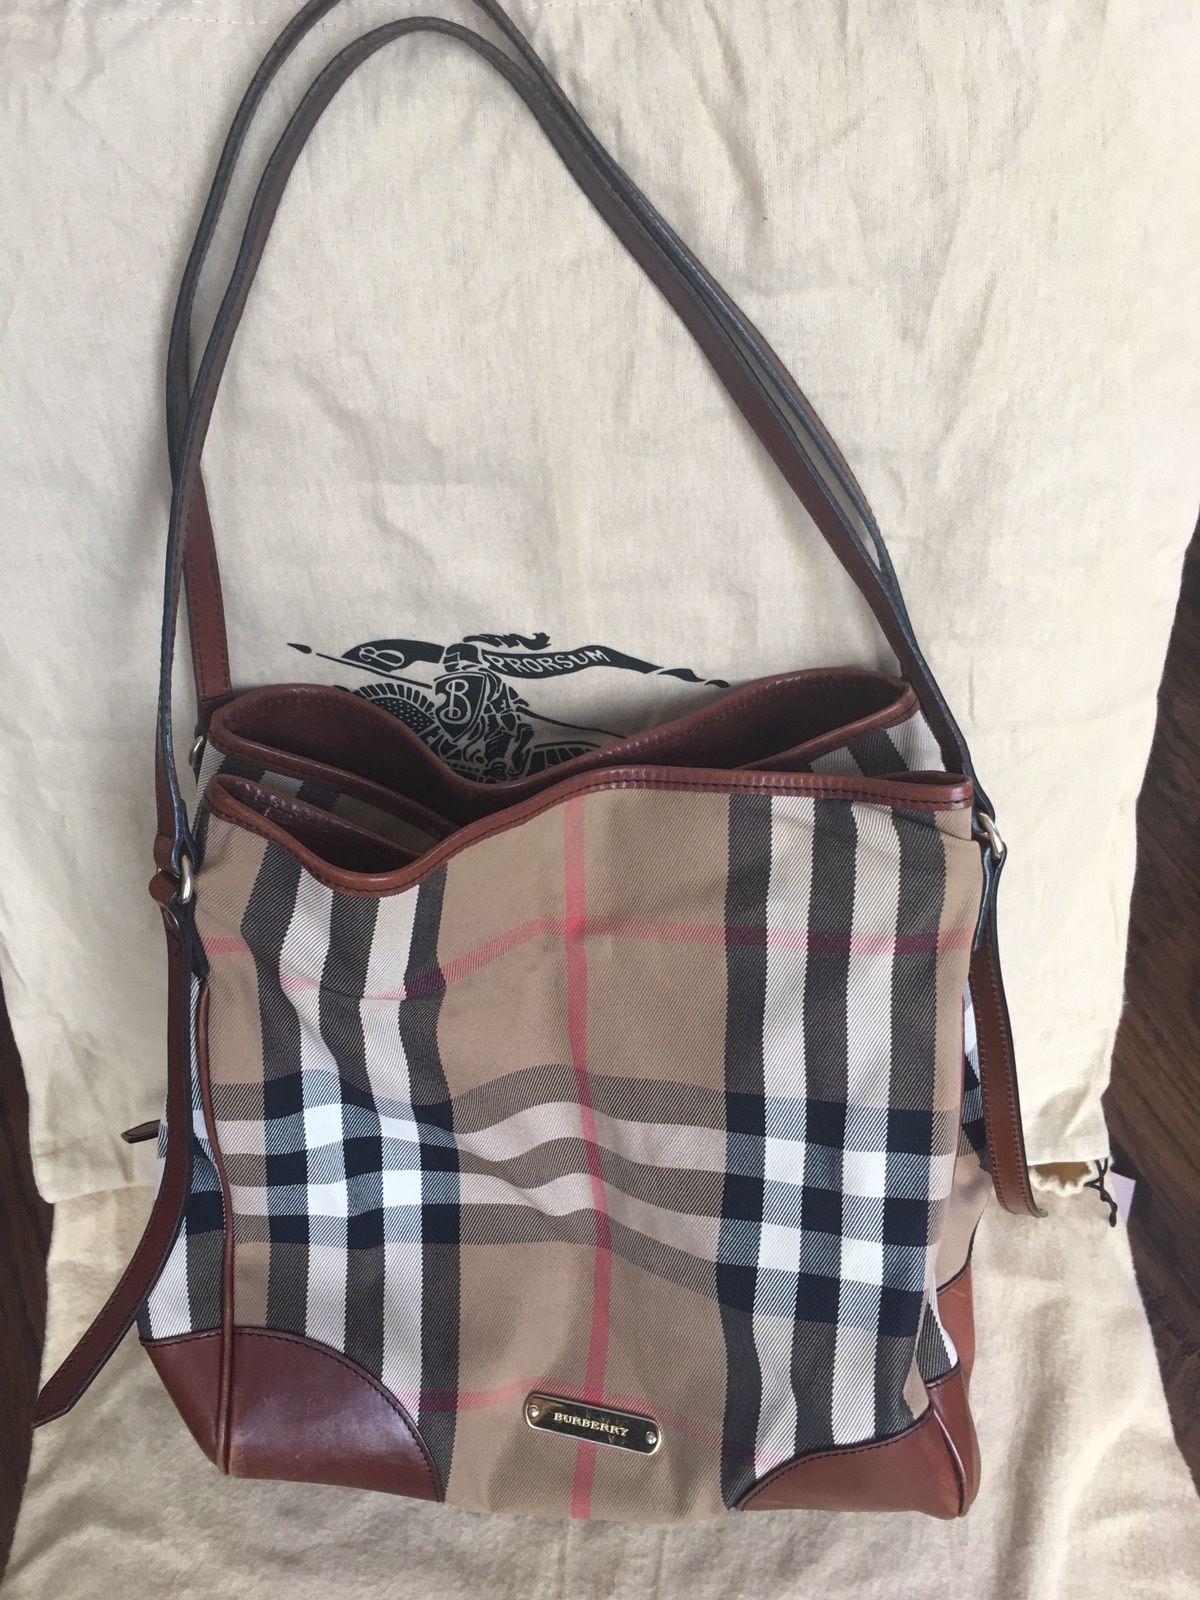 Burberry Handbag Authentic 305 0